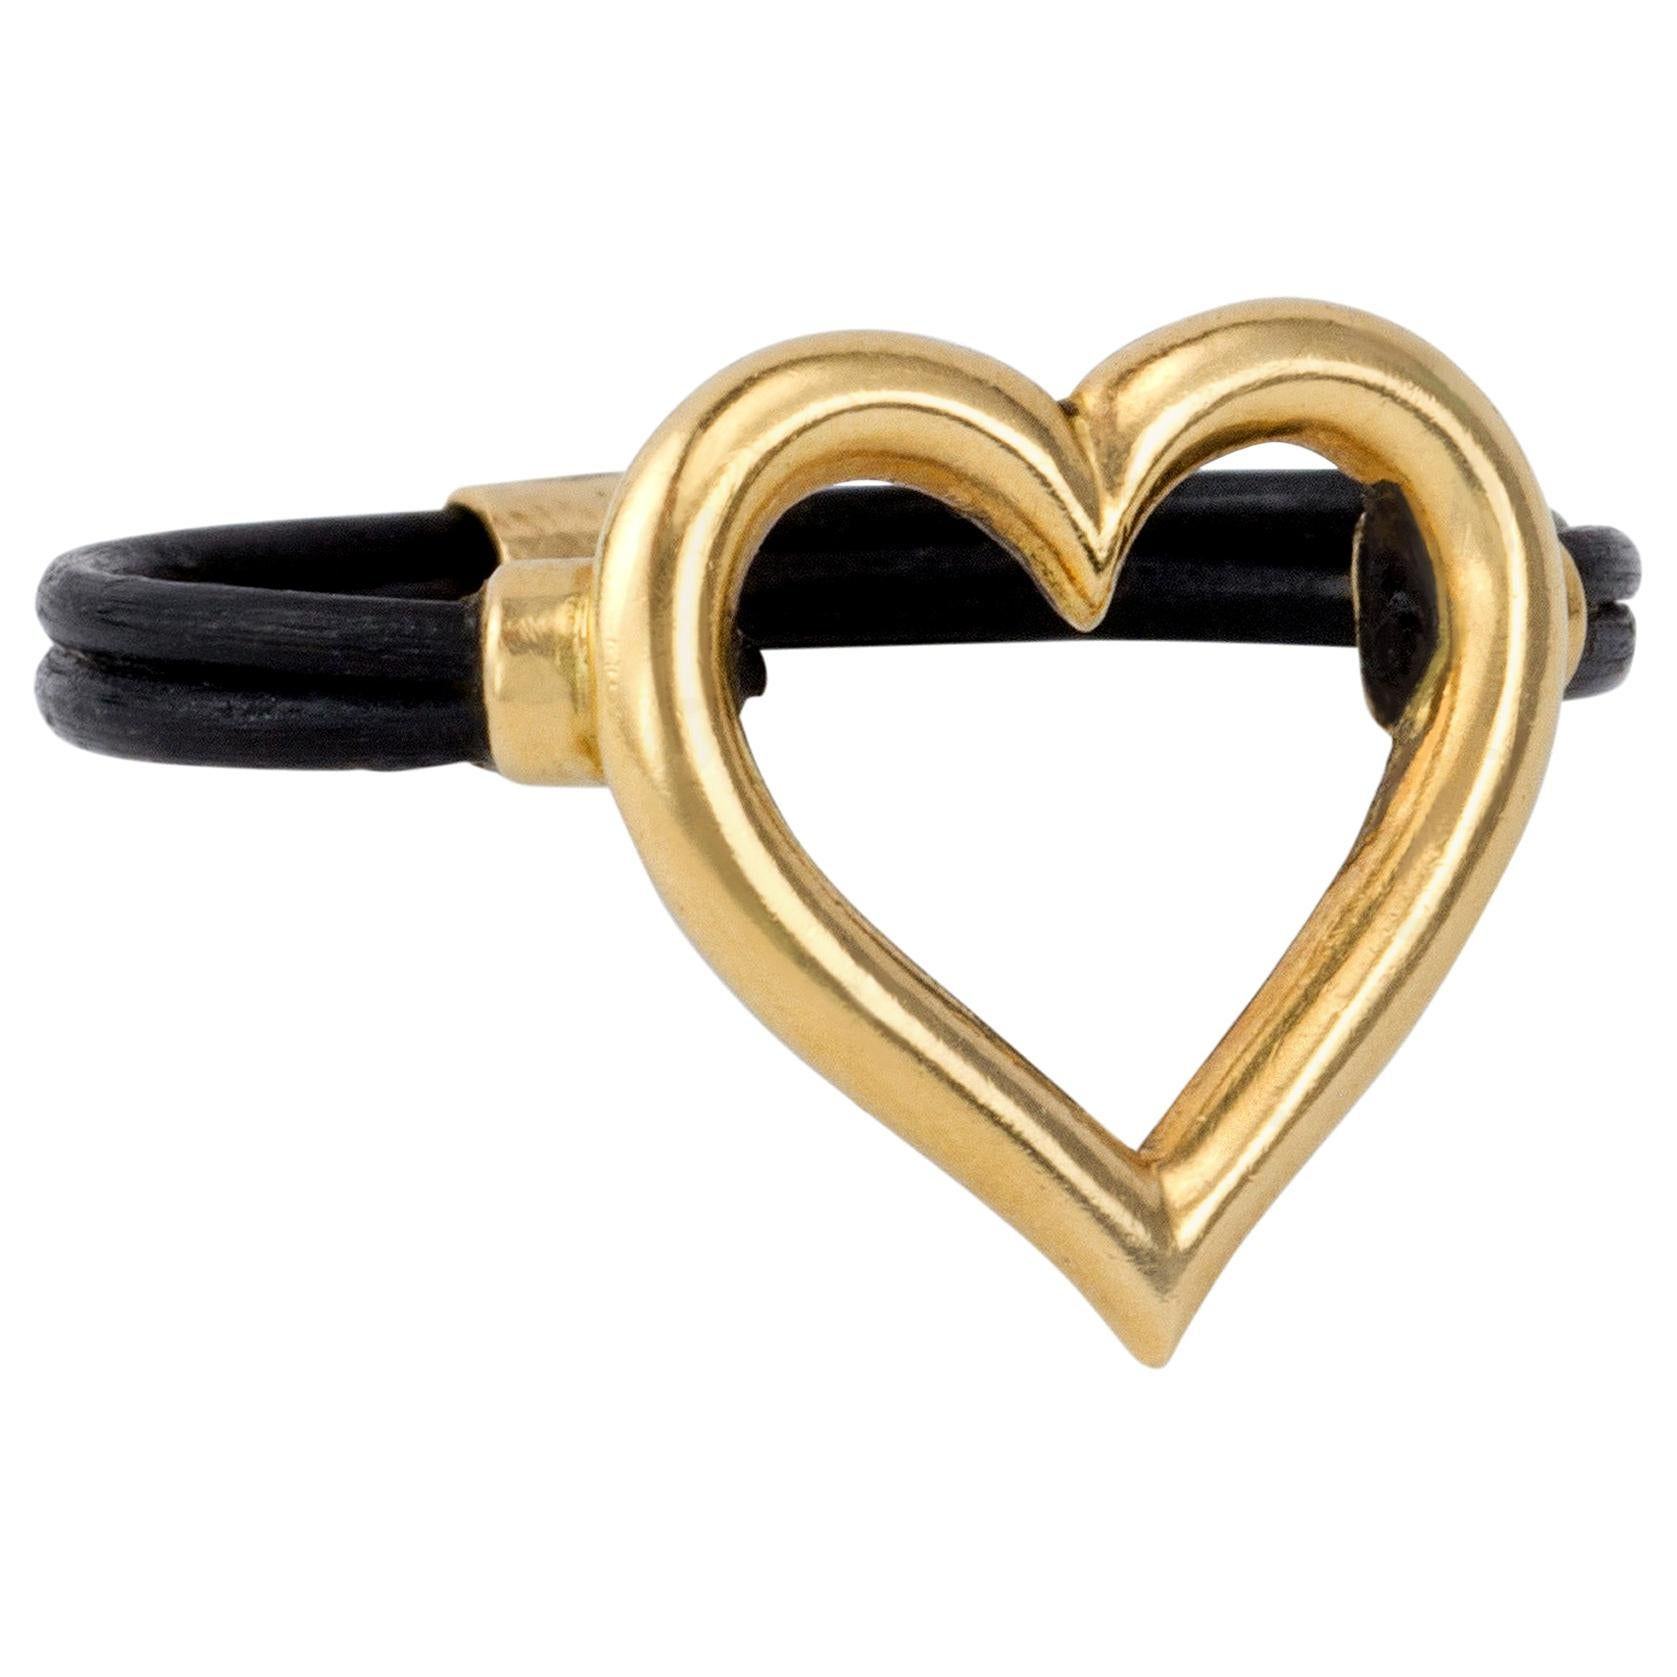 1970s Boucheron Elephant Hair and Gold Heart Ring